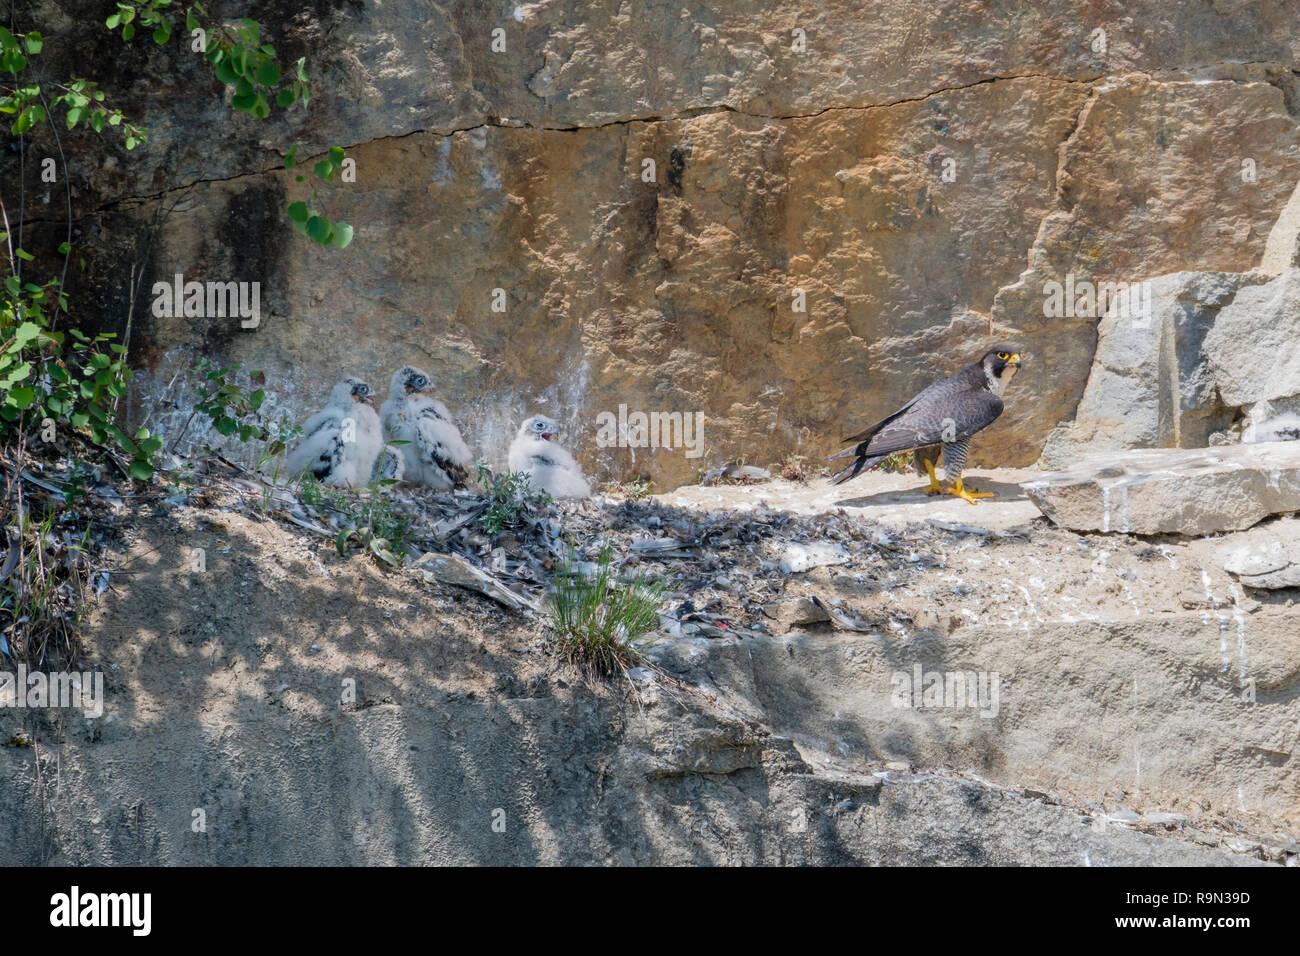 Wanderfalke Brut in Steilwand, Falco peregrinus, Peregrine falcon nesting in headwall Stock Photo